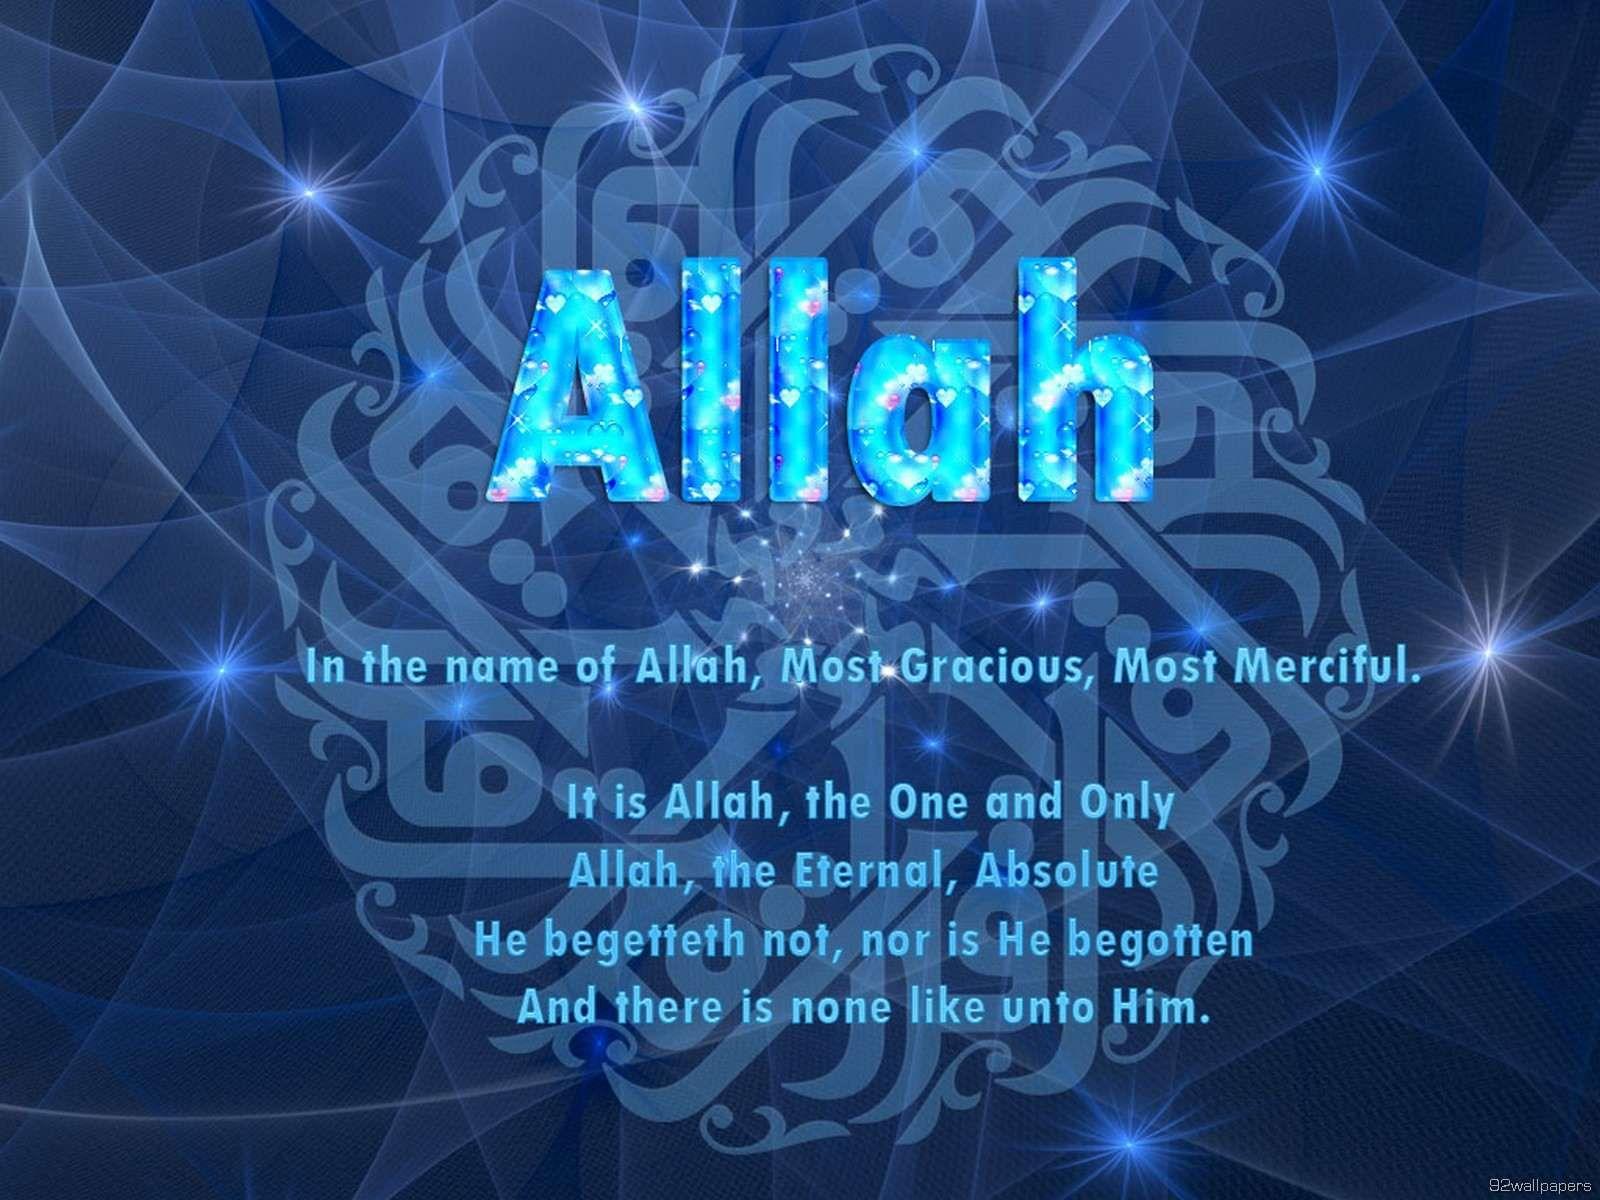 sacred wallpapers beautiful allah name hd islamic wallpapers hd images hd islam gallery